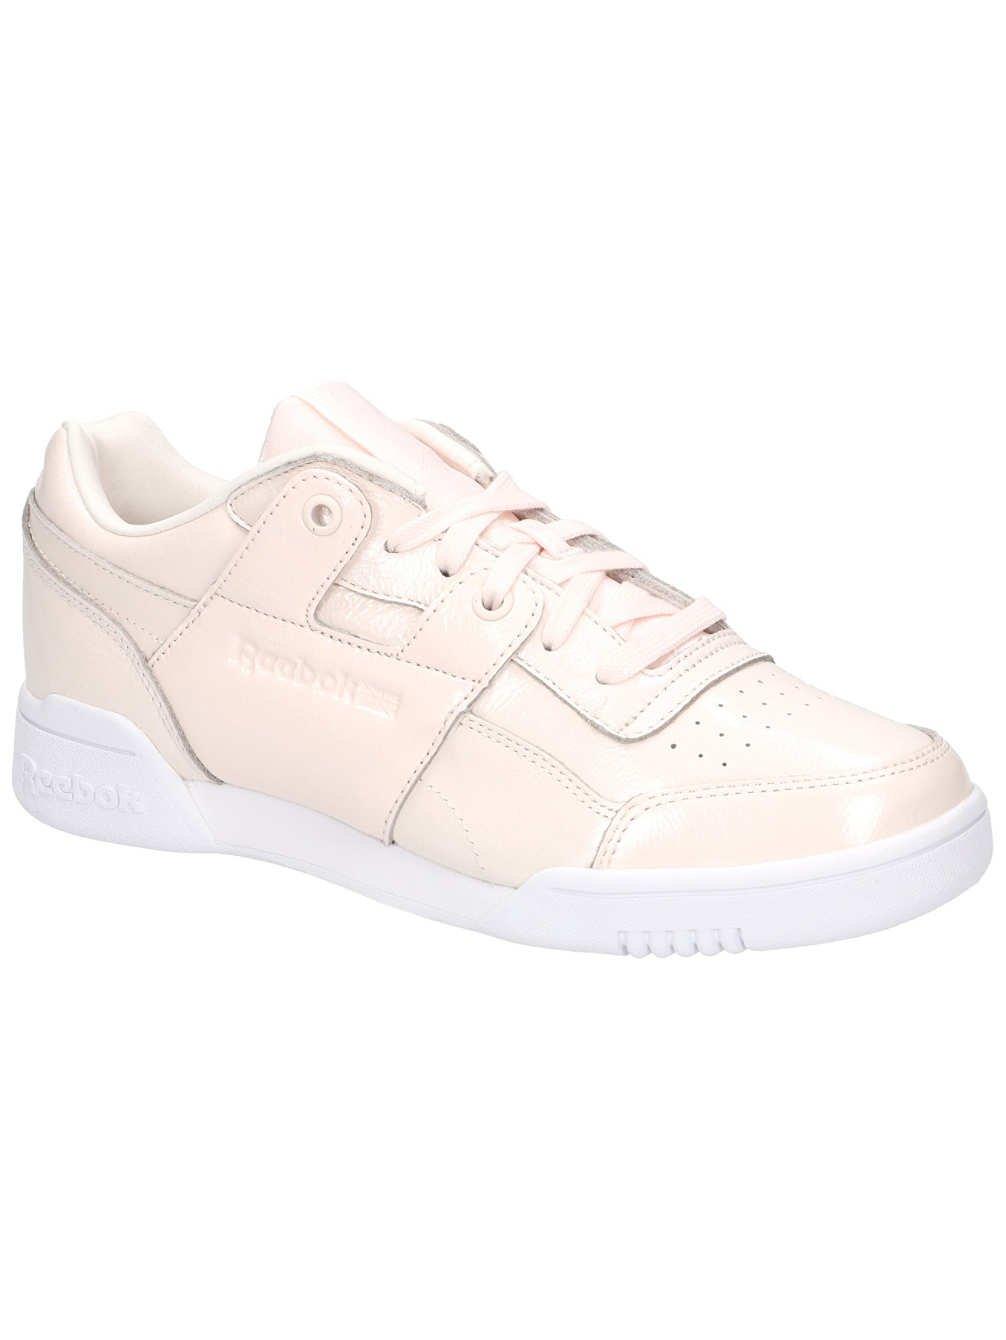 Reebok W/oder was Iridescent Plus Iridescent was – Sneaker Rosa 24e6fa